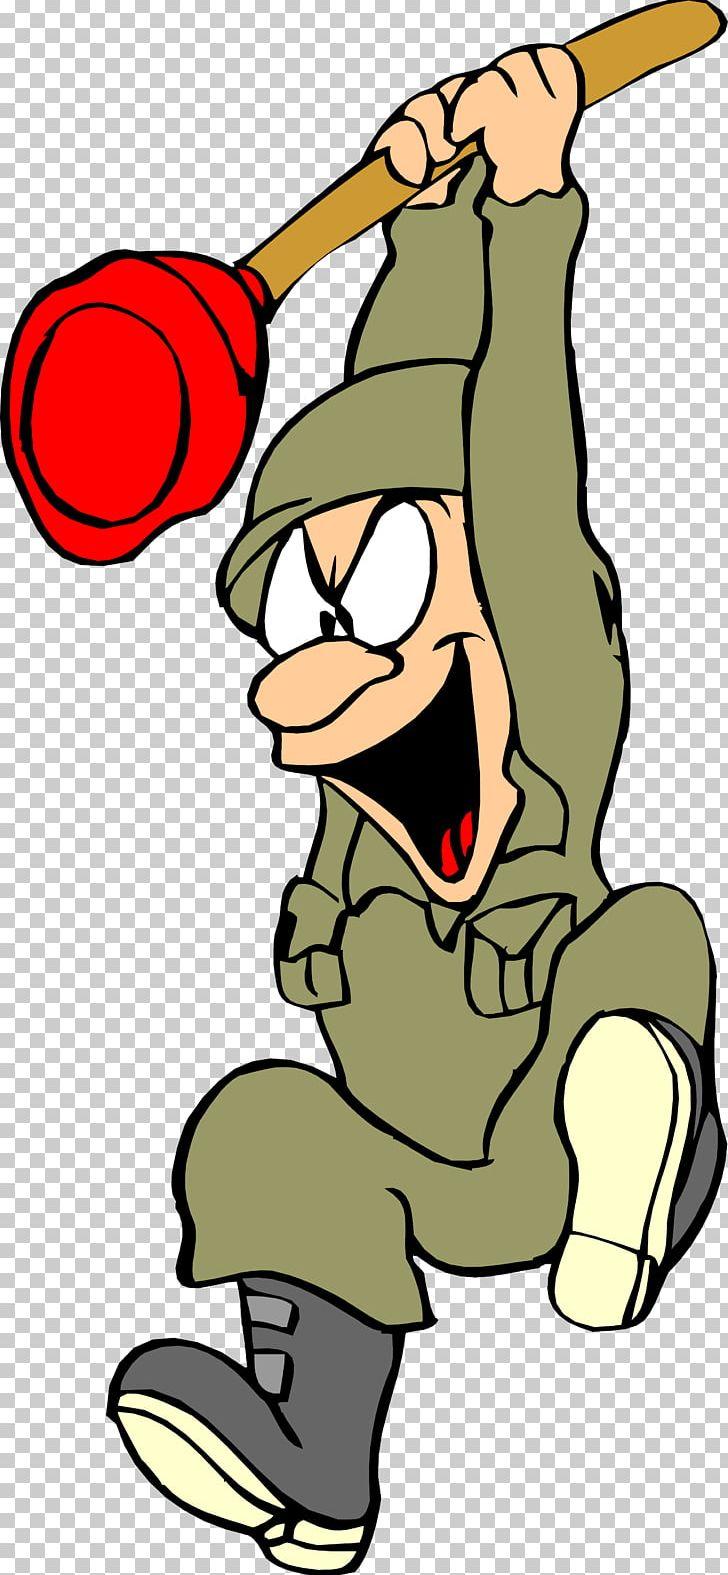 GIF Military Cartoon PNG, Clipart, Animation, Anime, Area